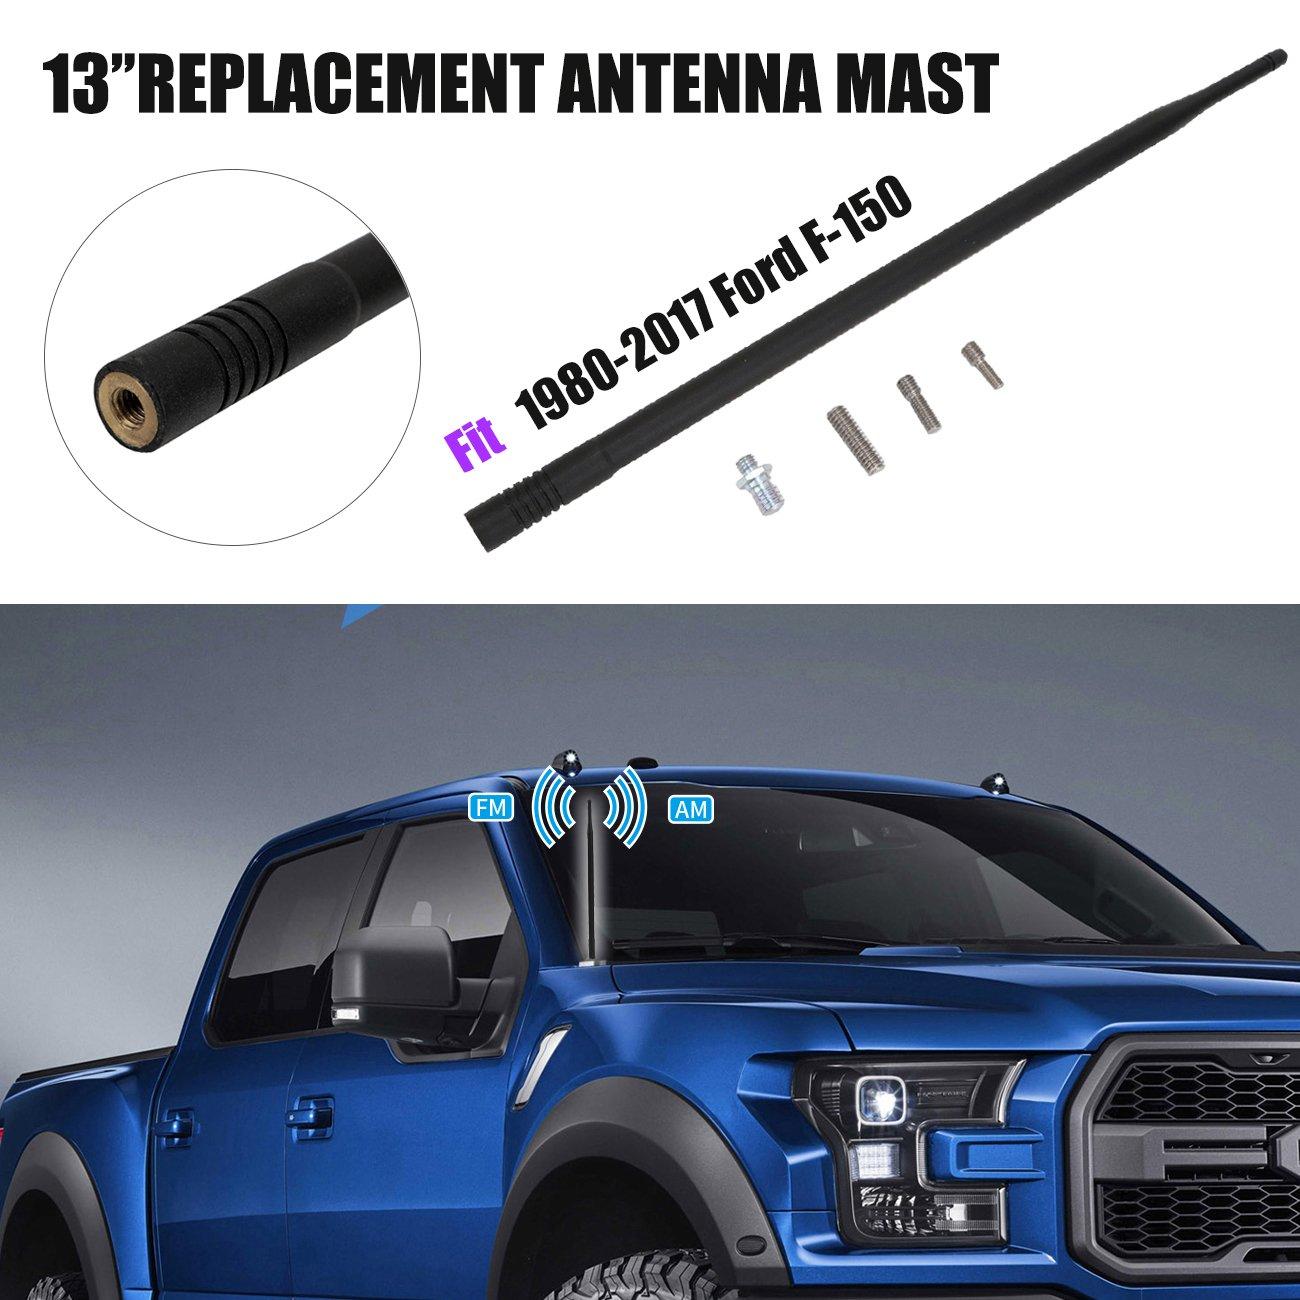 13 Short Custom Antenna Mast for Ford F-150 1980-2017